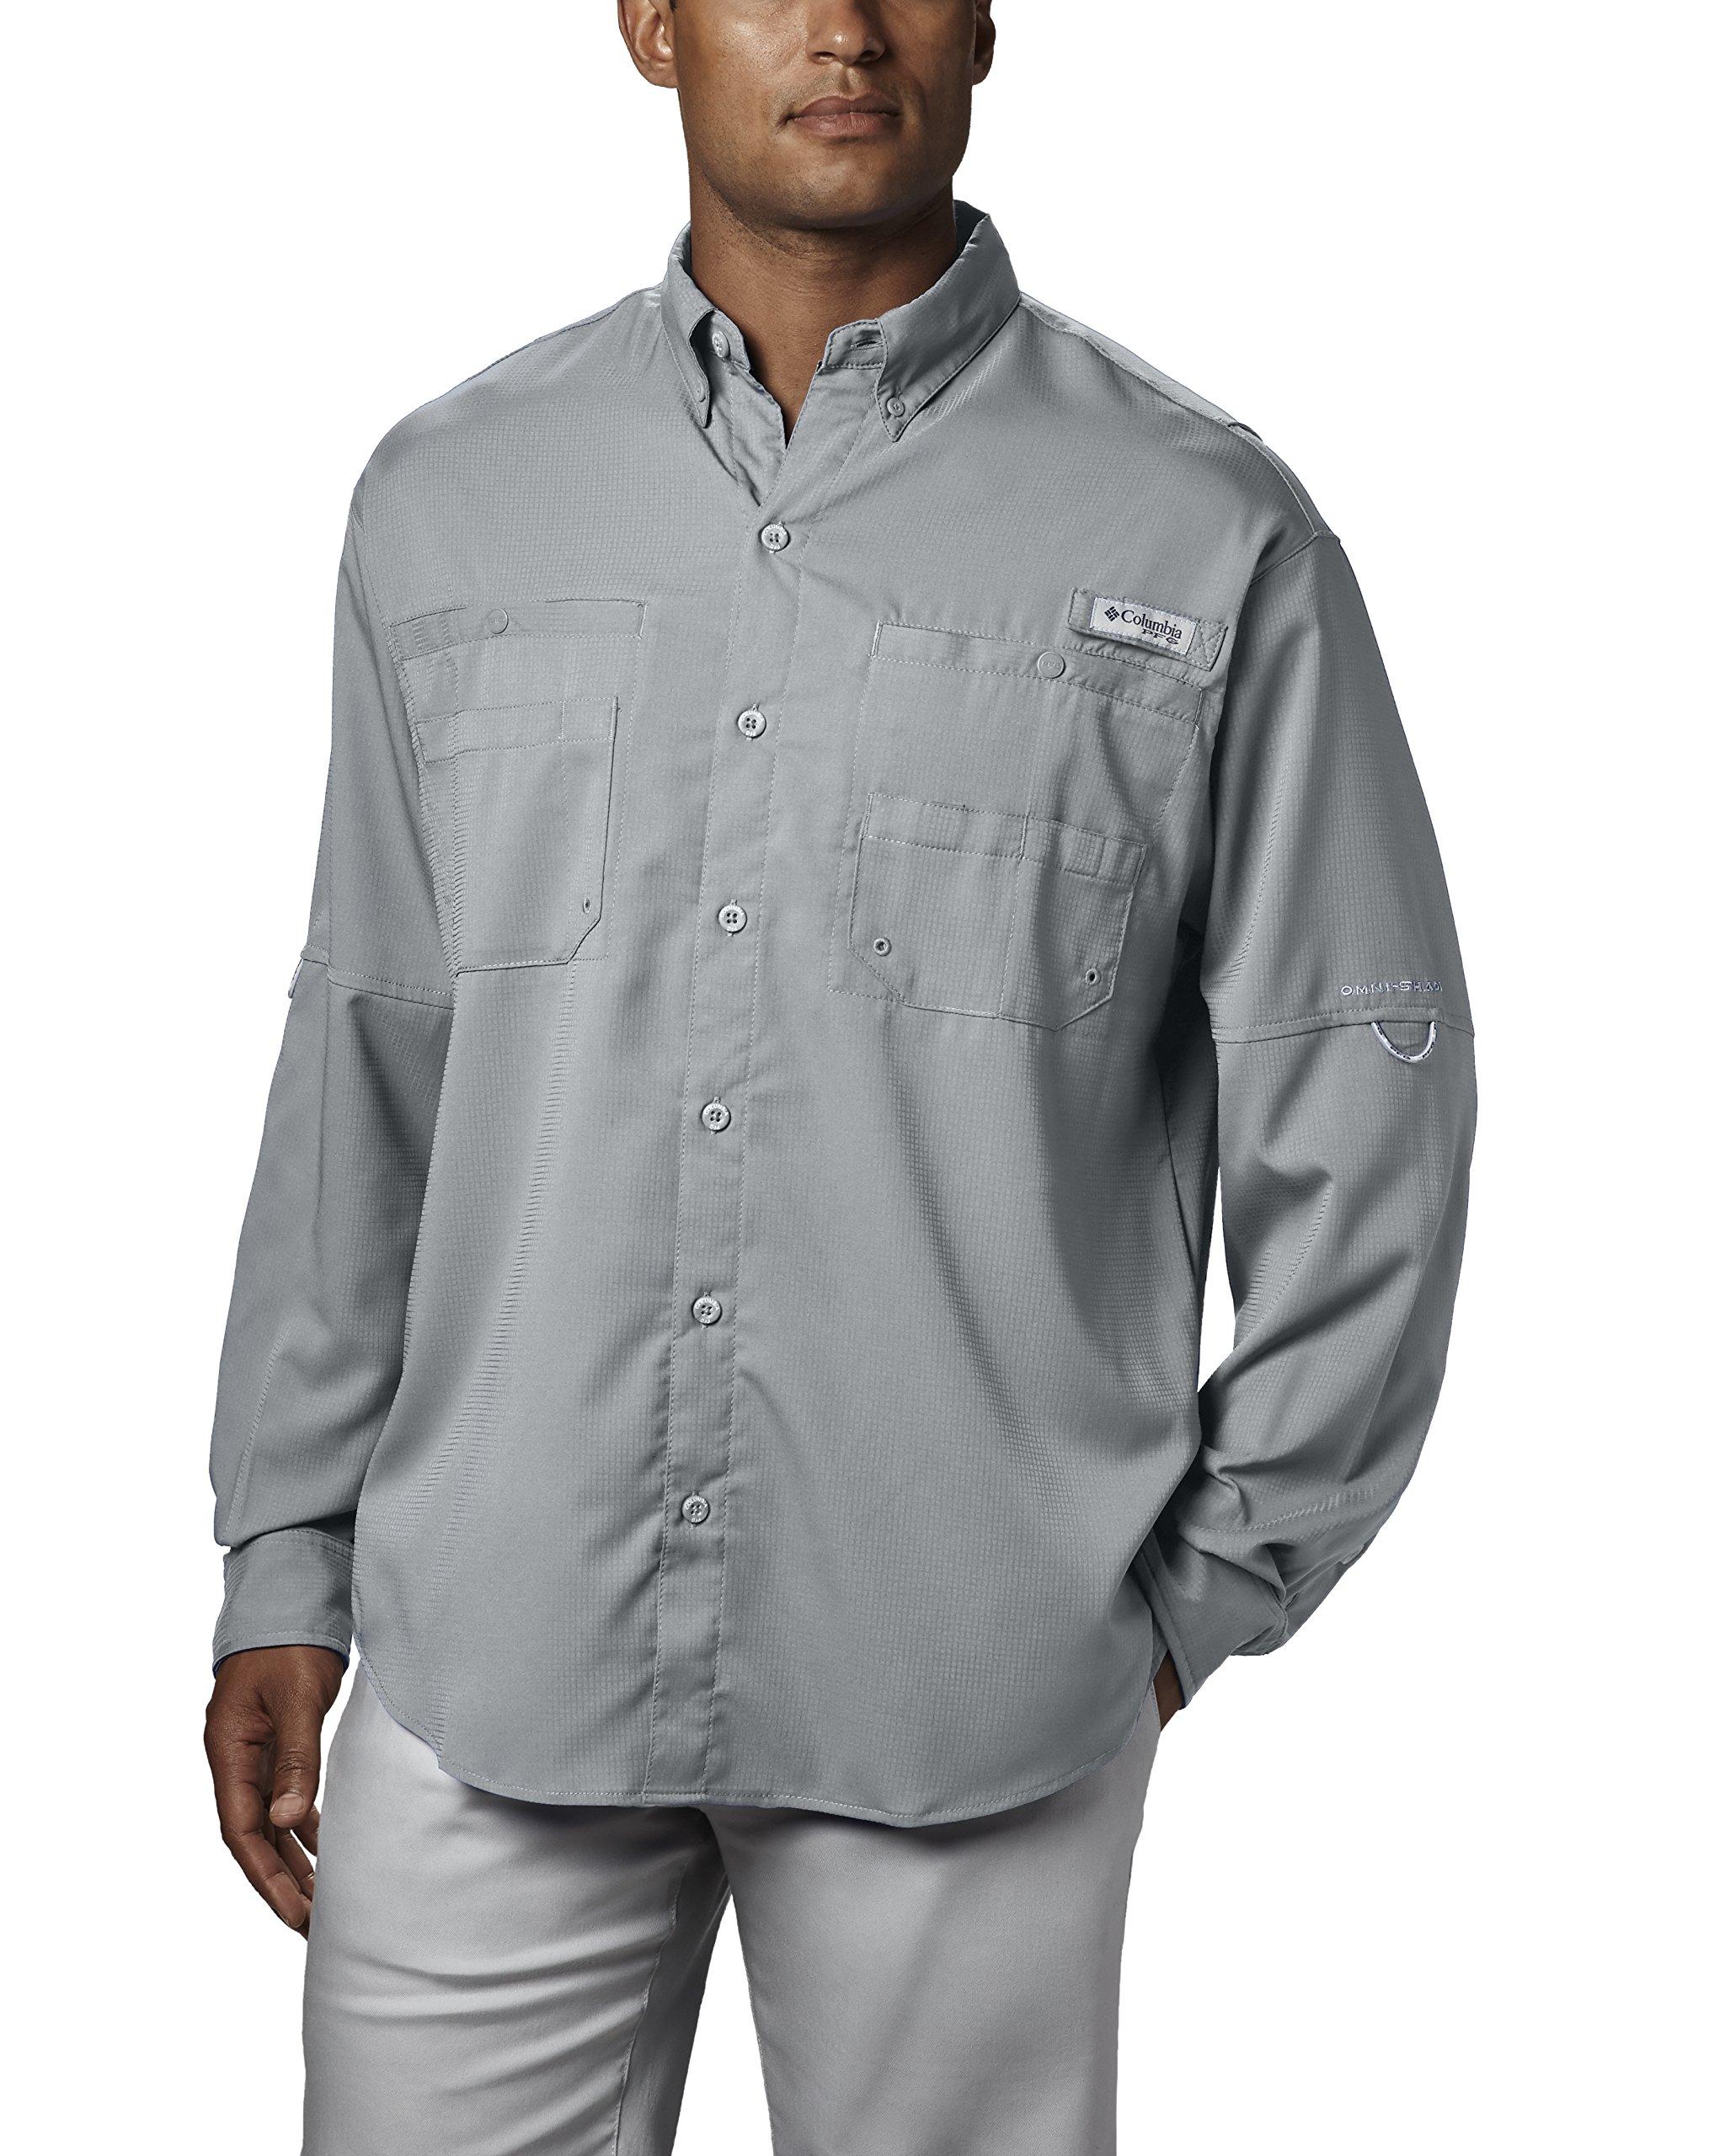 4a0b0fa2d96 Columbia Men's Tamiami II LS Shirt,Cool Grey,XXL | Amazon 智慧估價| 得利購DirectGo  - 海運,空運,美國代購美國代買